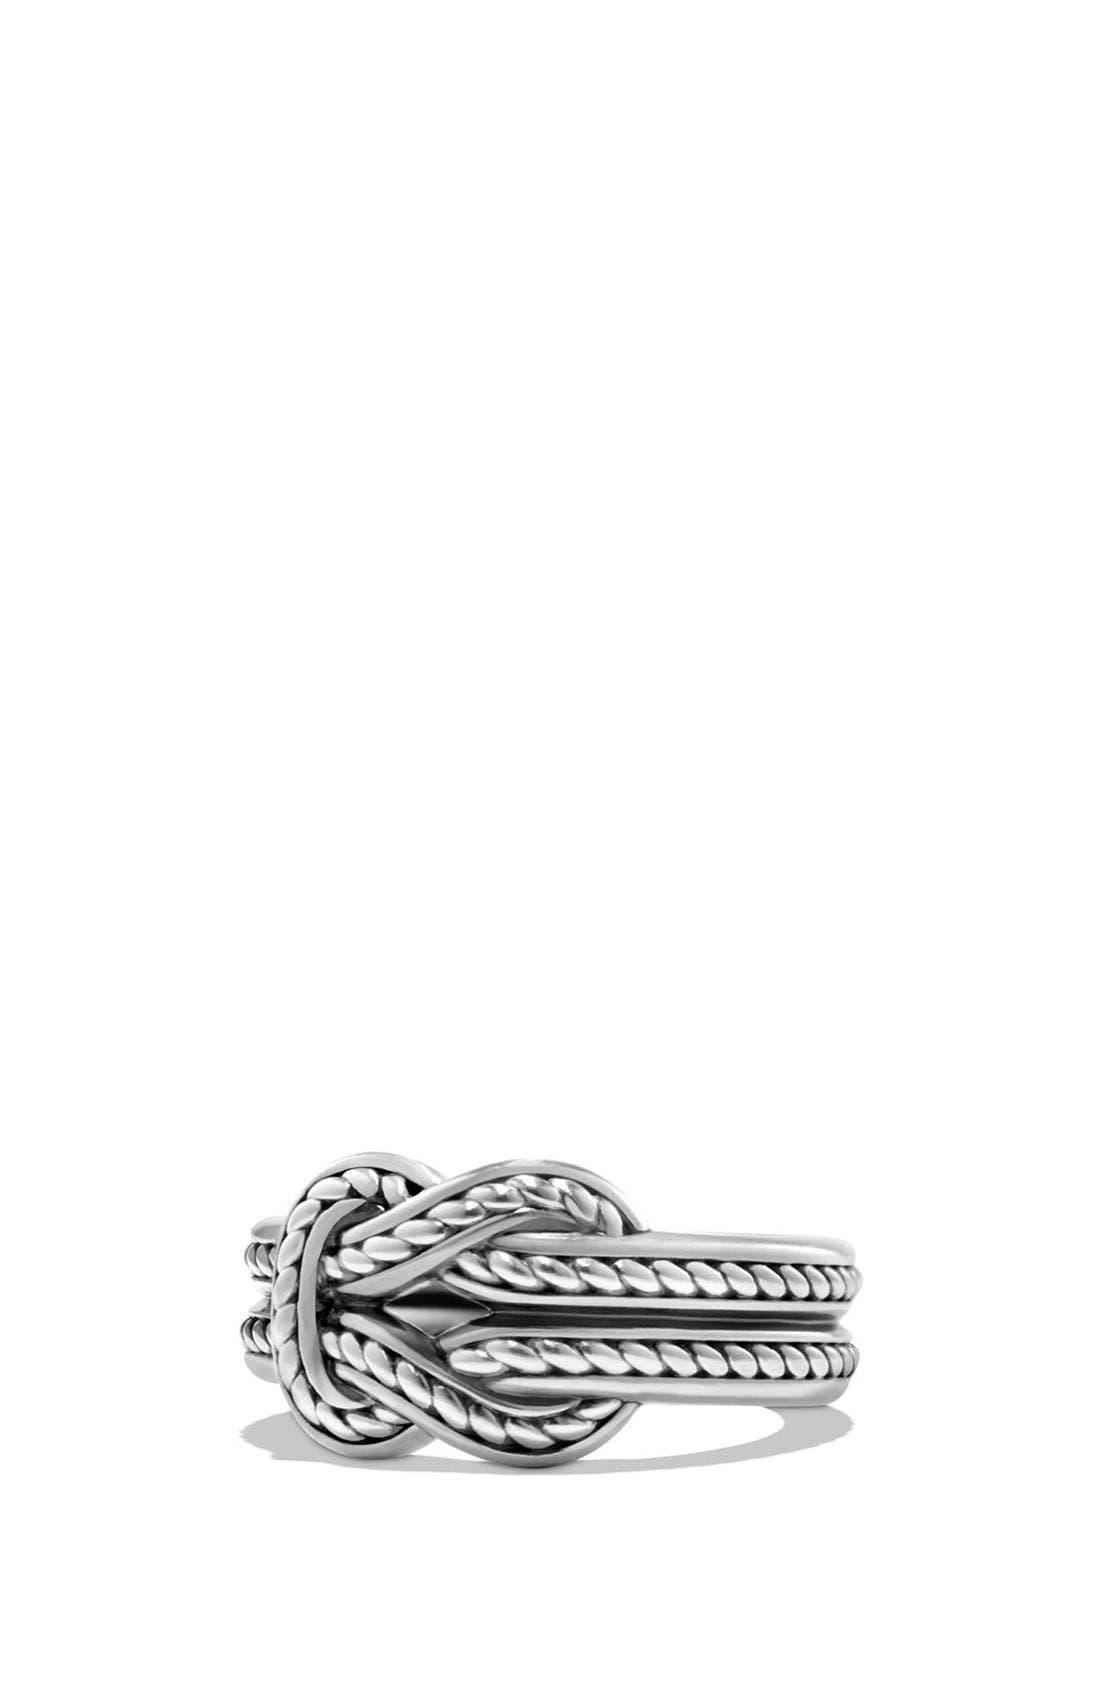 David Yurman 'Maritime' Reef Knot Band Ring